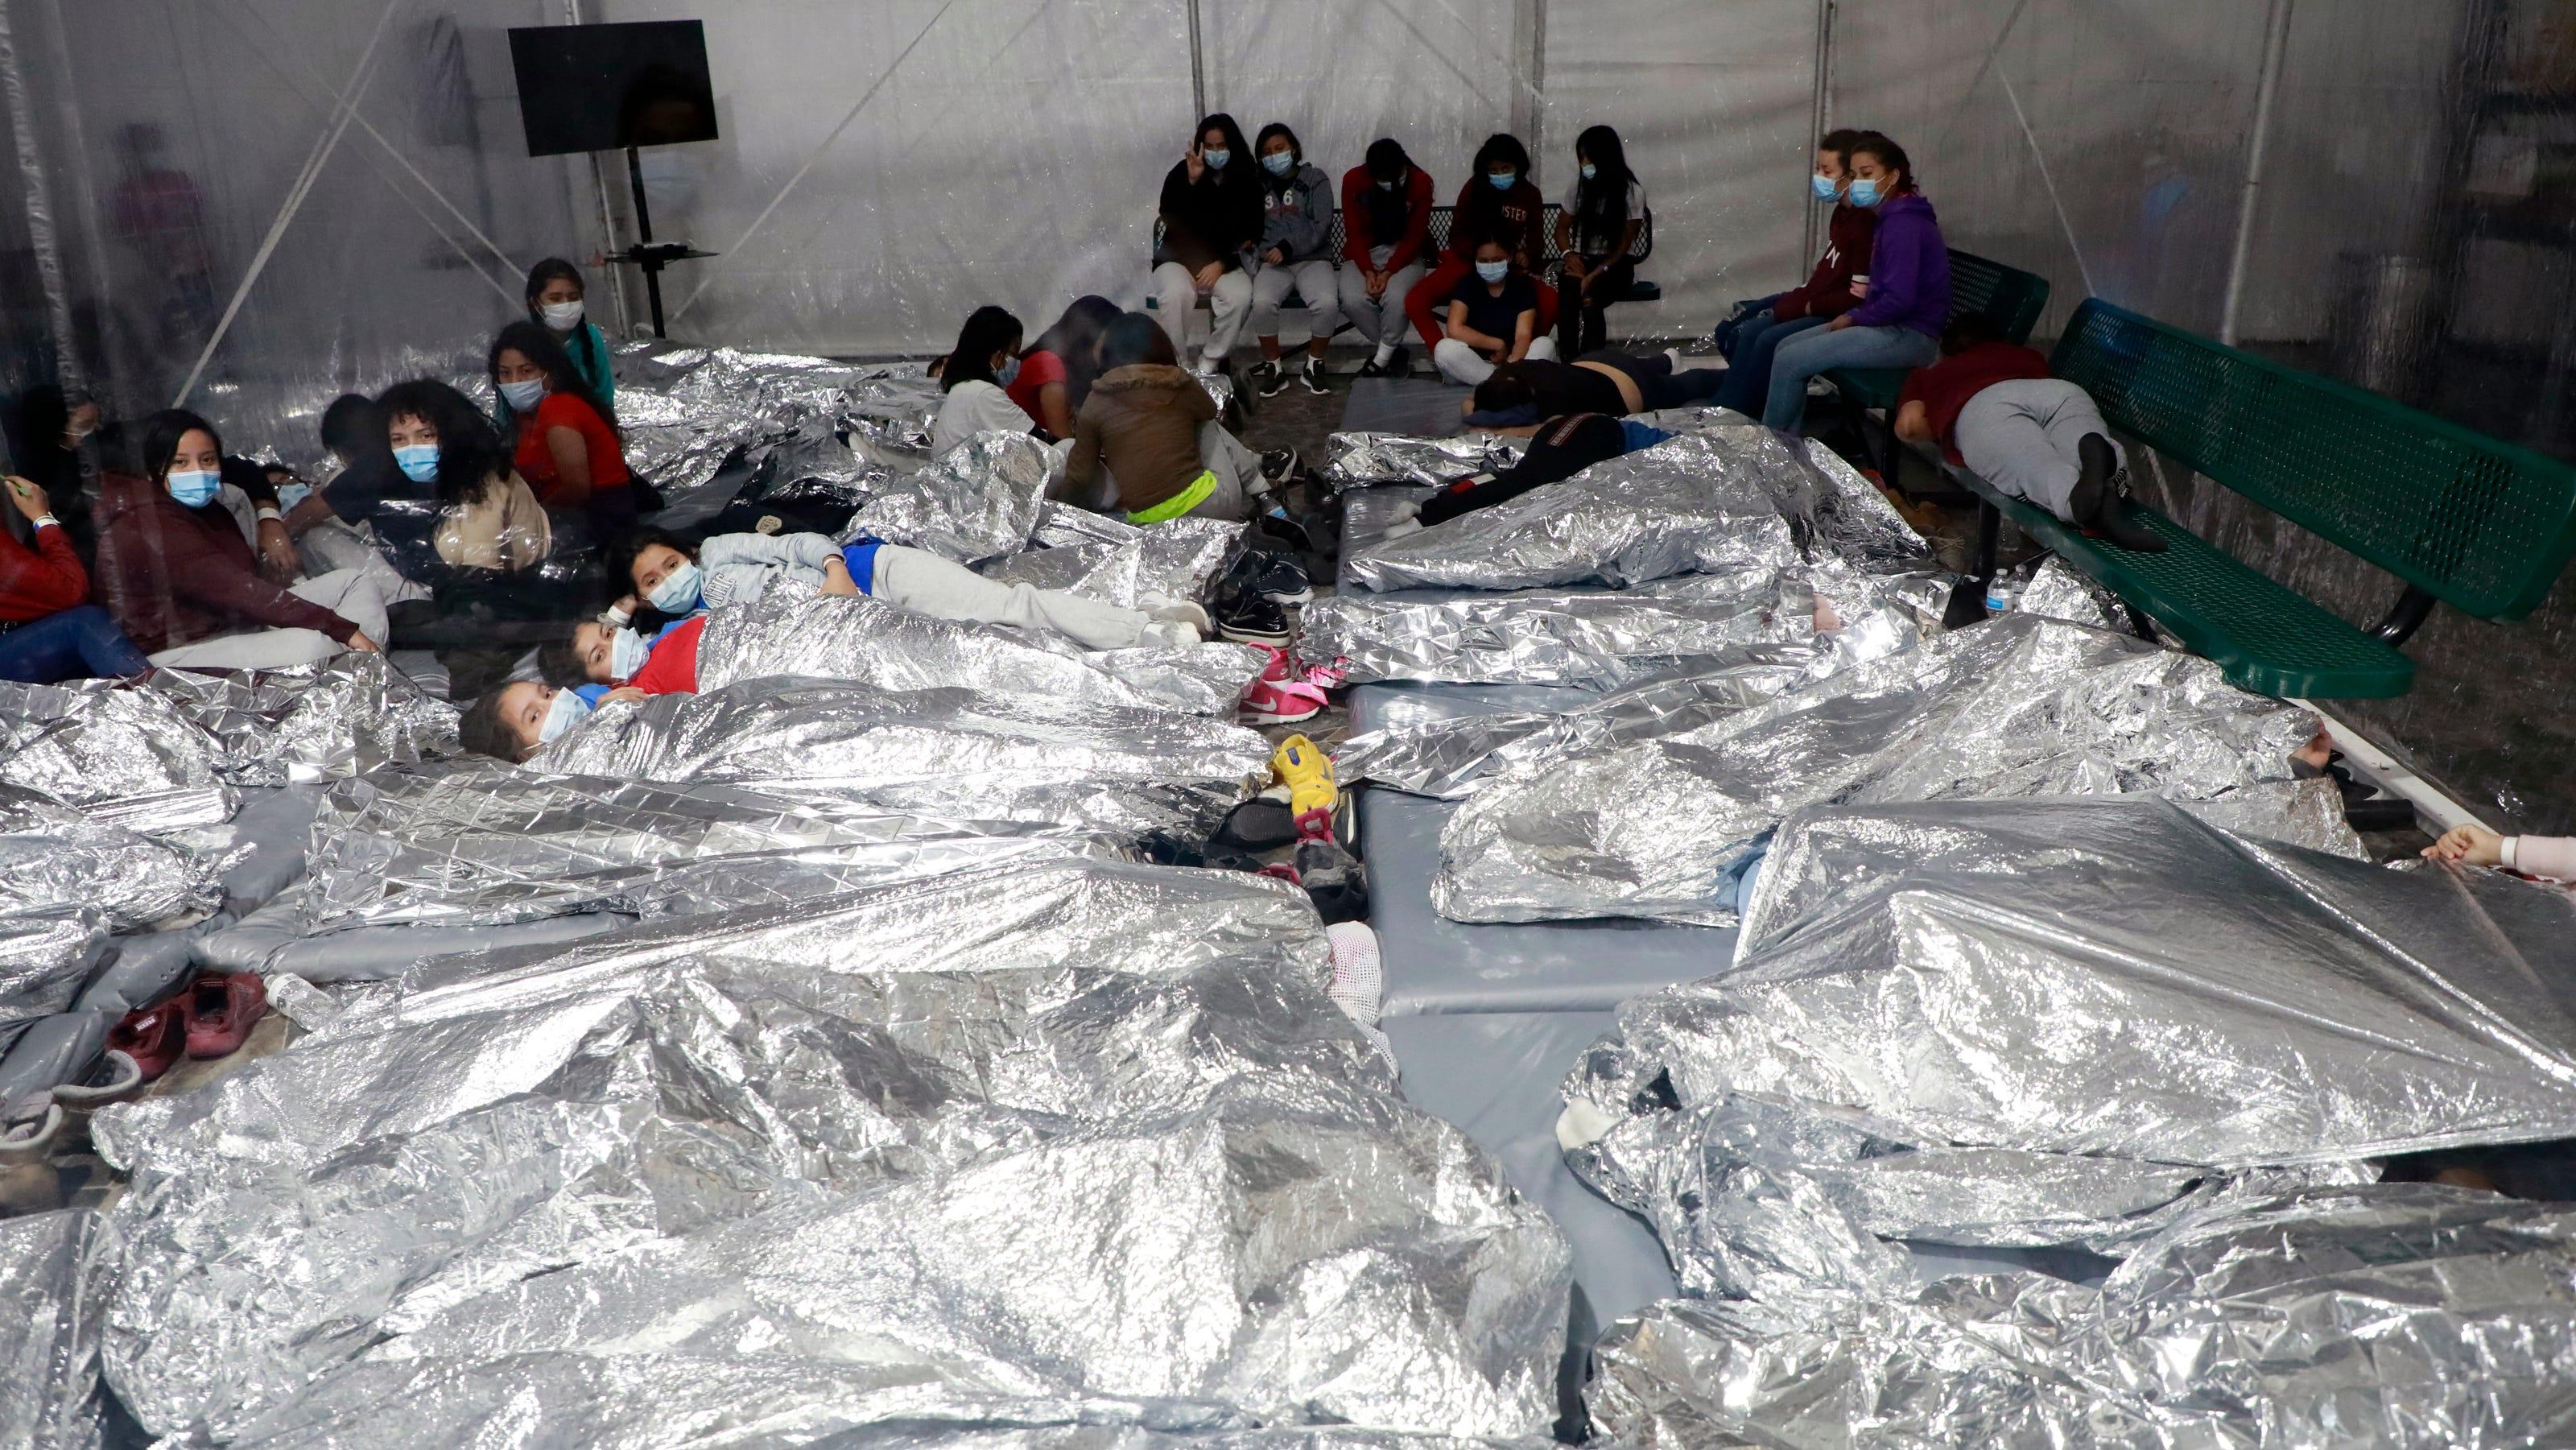 de087a7c-b731-421a-822c-e84153ff2f1d-Migrant_Children_Detention_Center_01.JPG